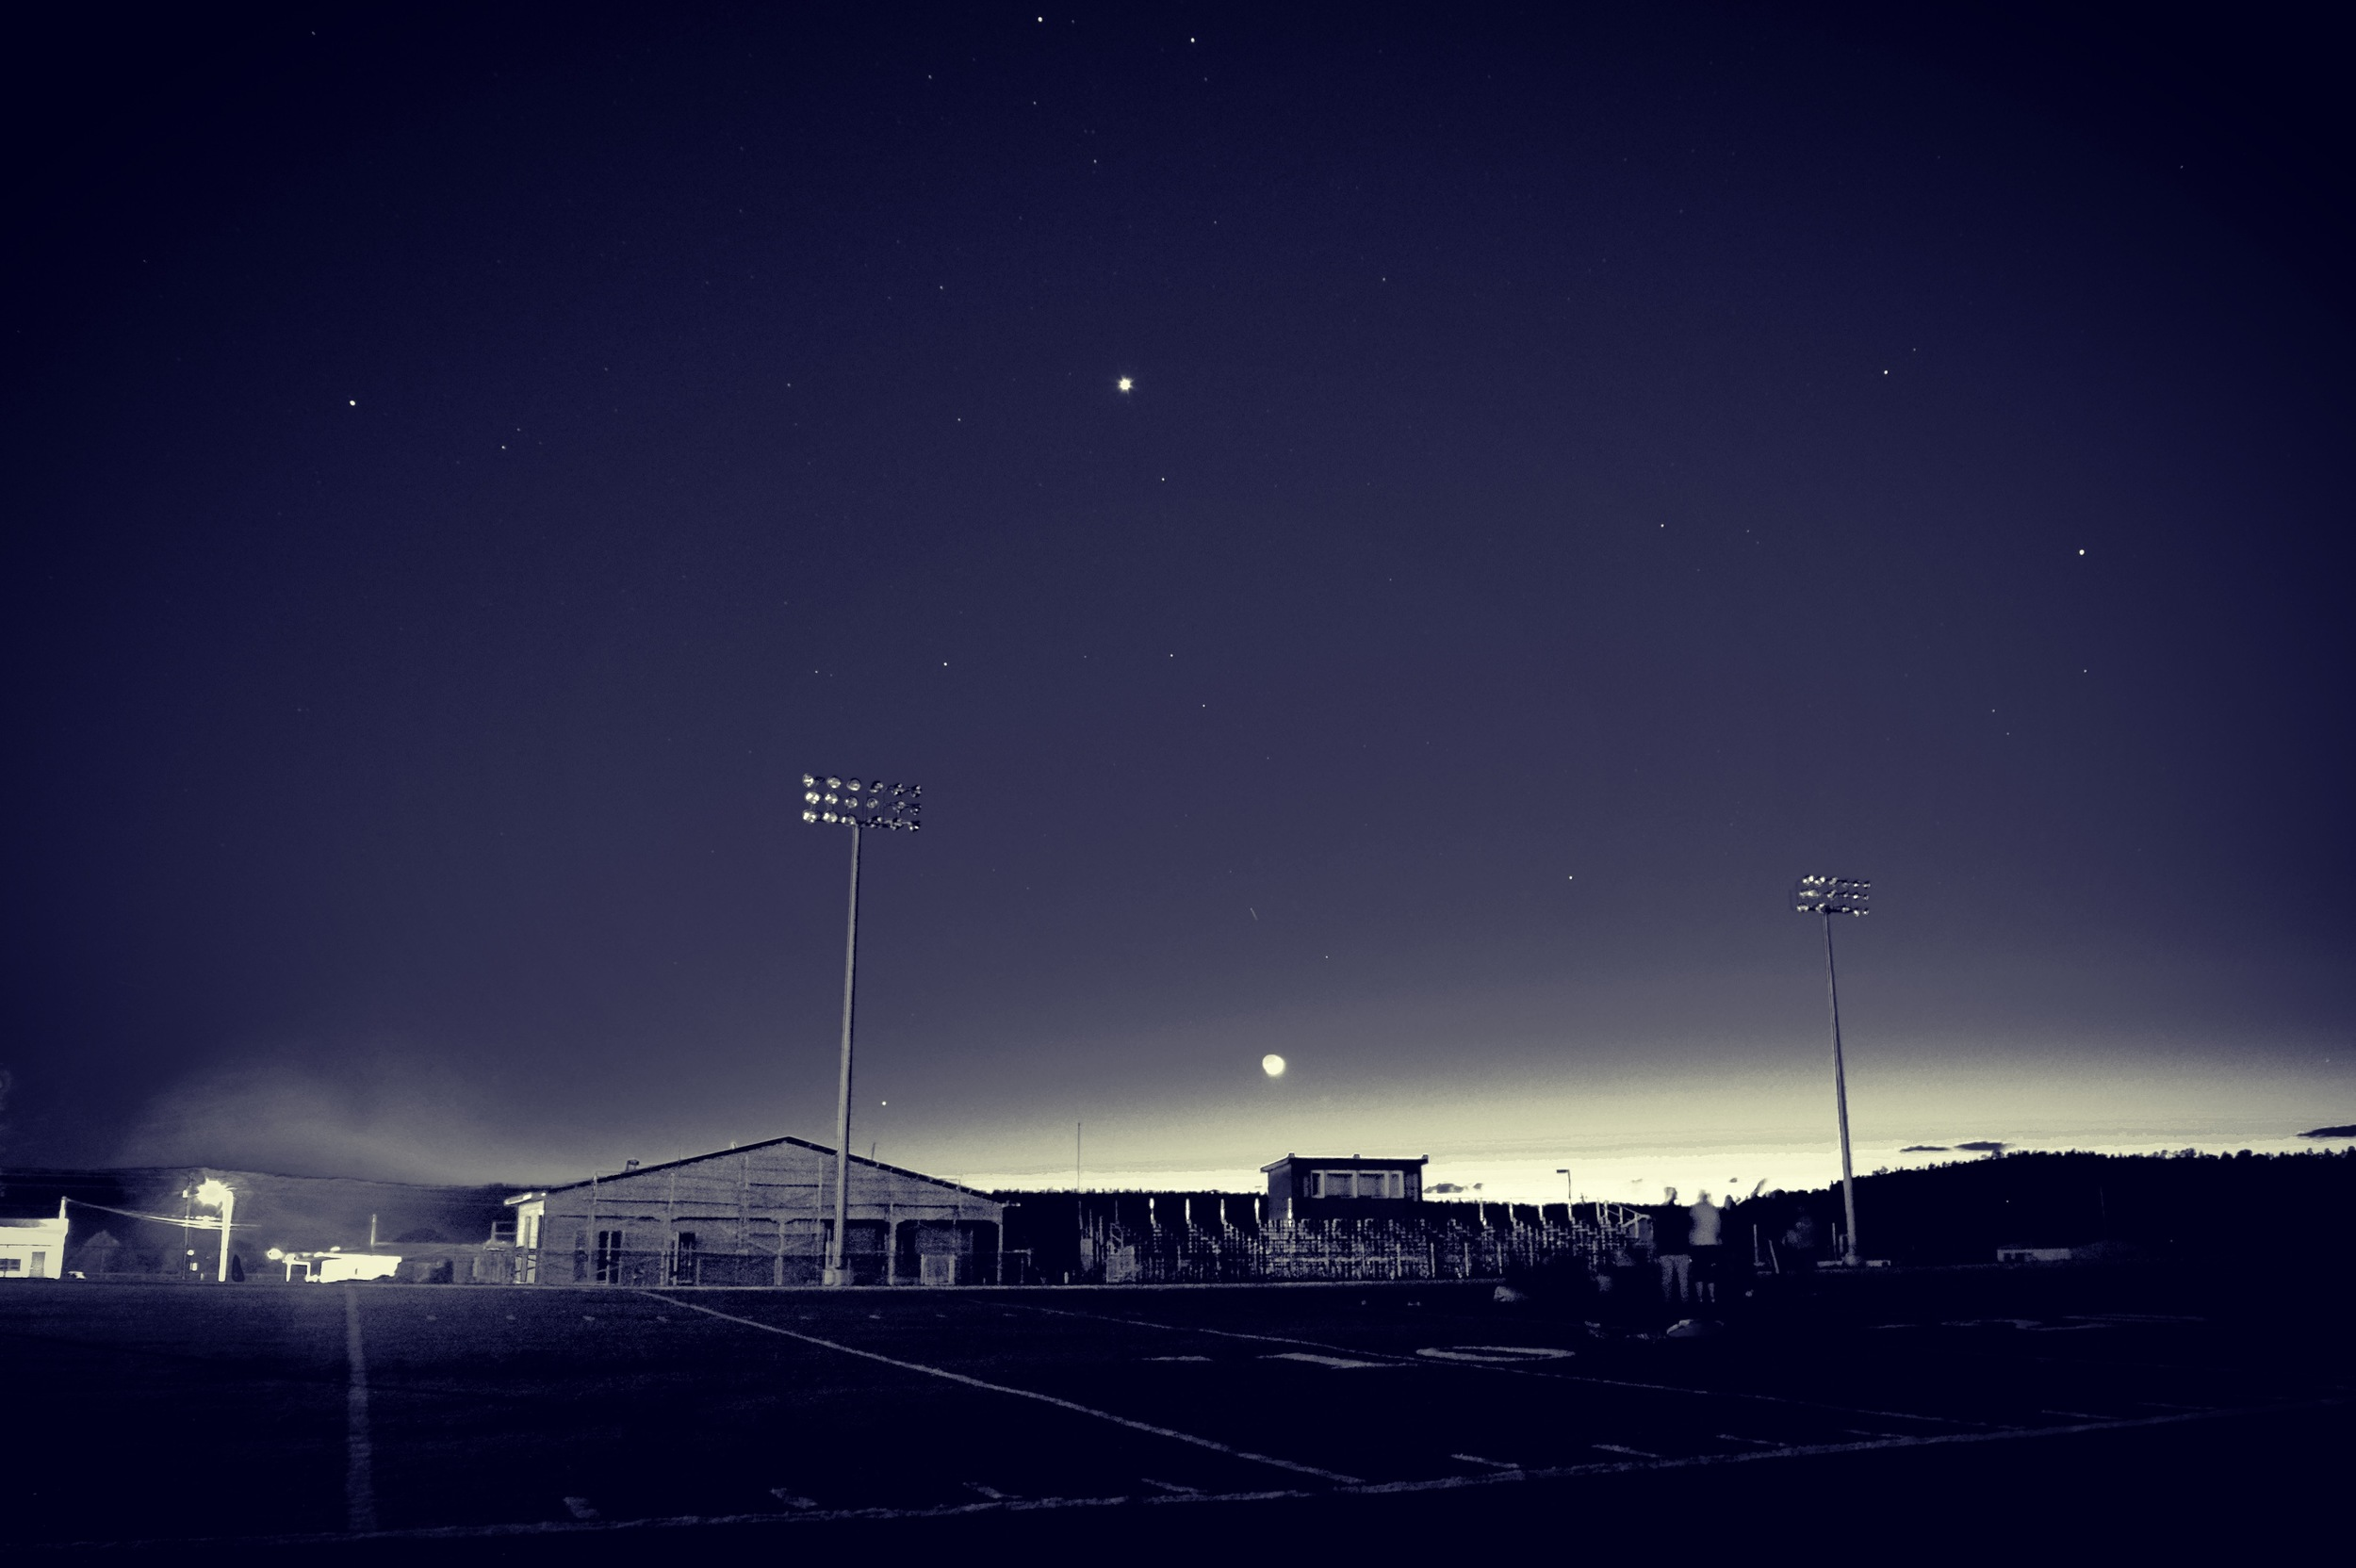 Stargazing at Cuba Middle School